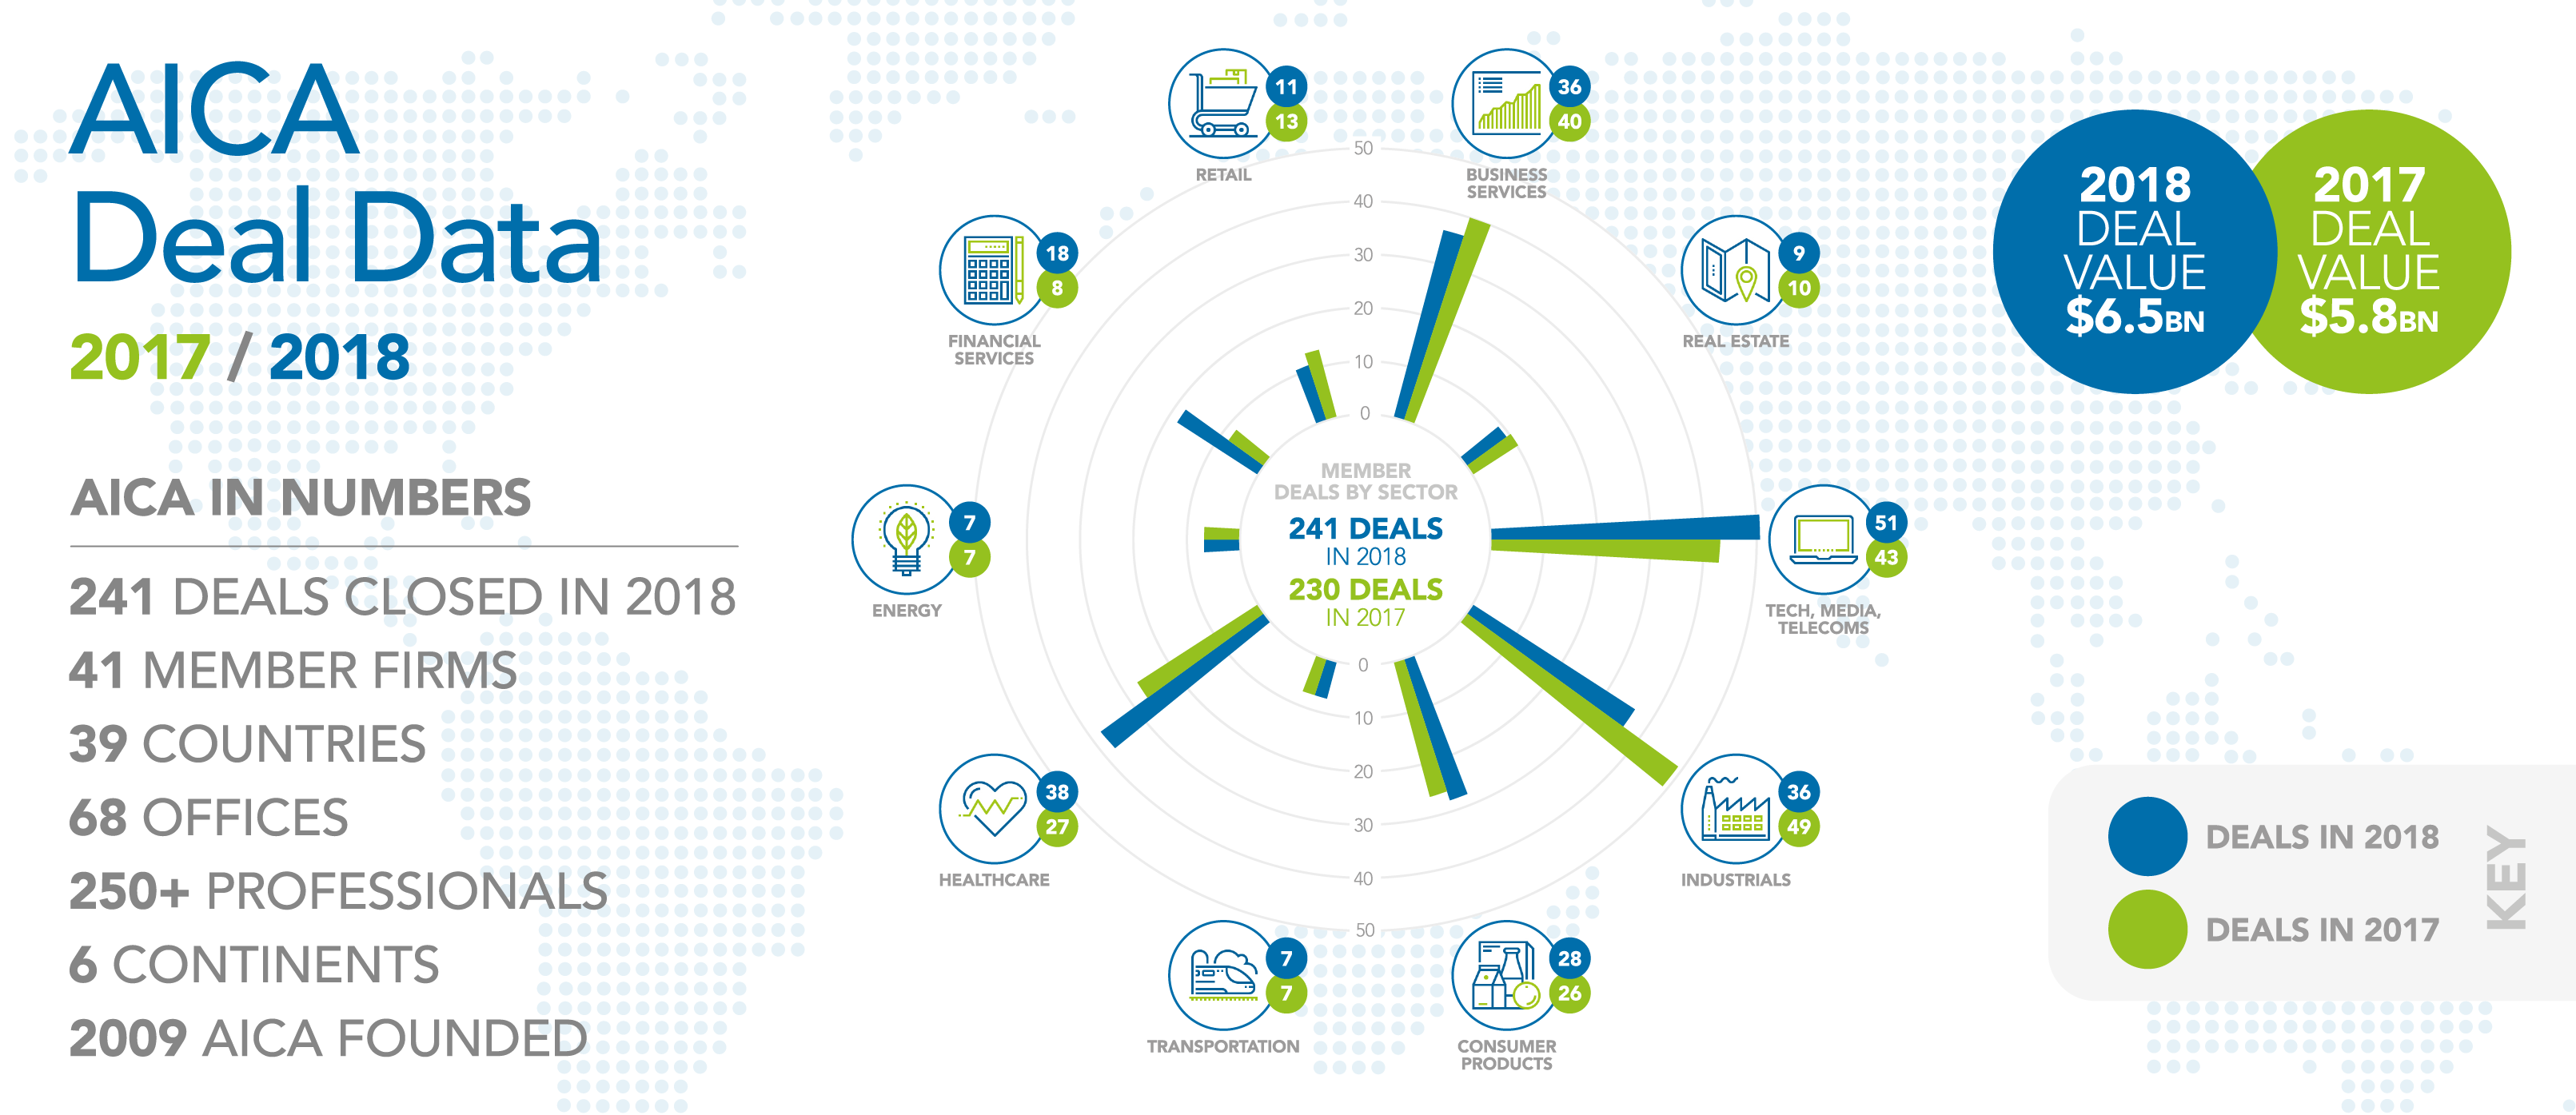 aica-infographic-2017-18